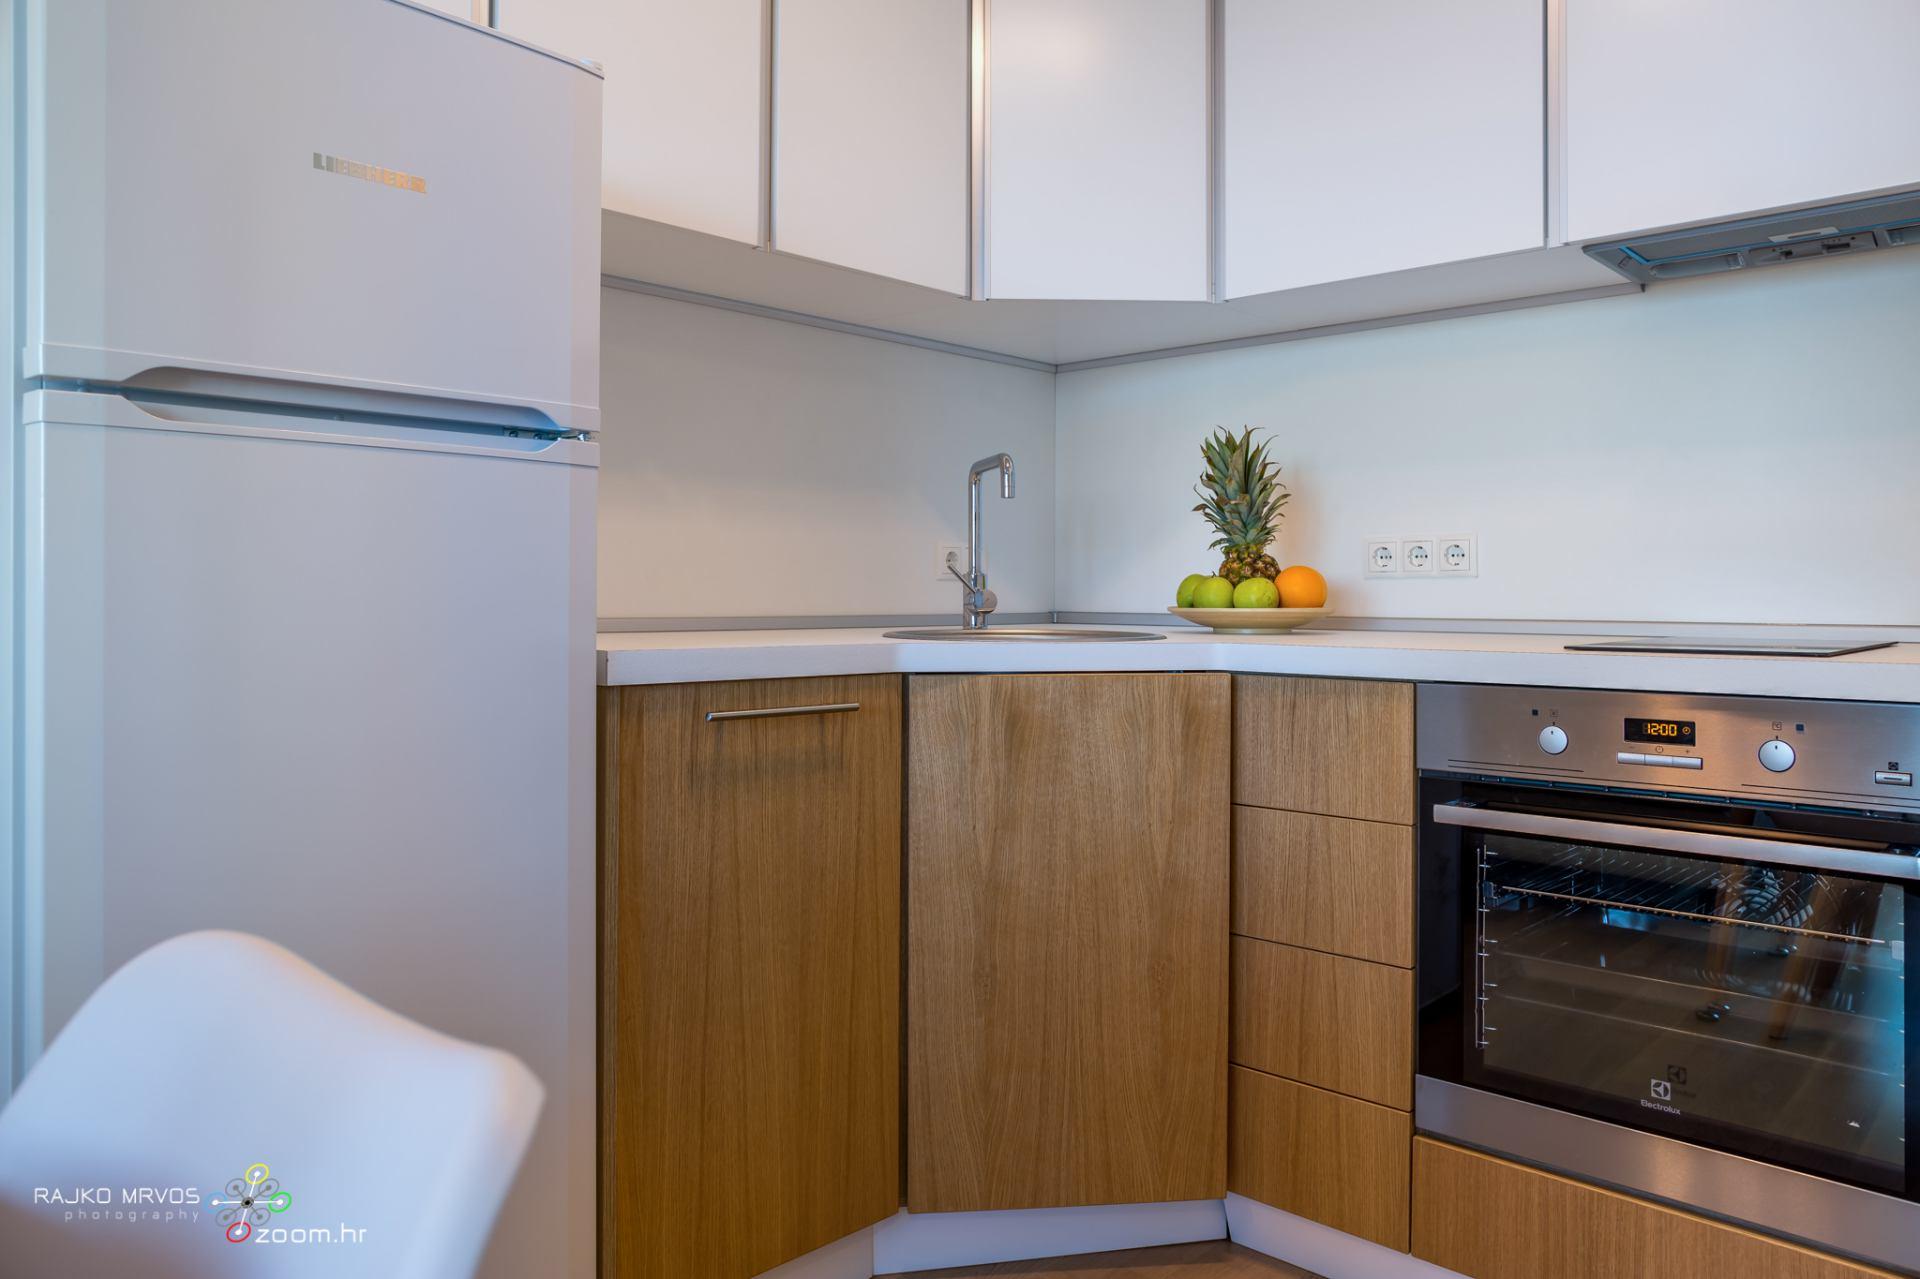 fotografiranje-interijera-fotograf-eksterijera-apartmana-vila-kuca-apartman-Beč-17